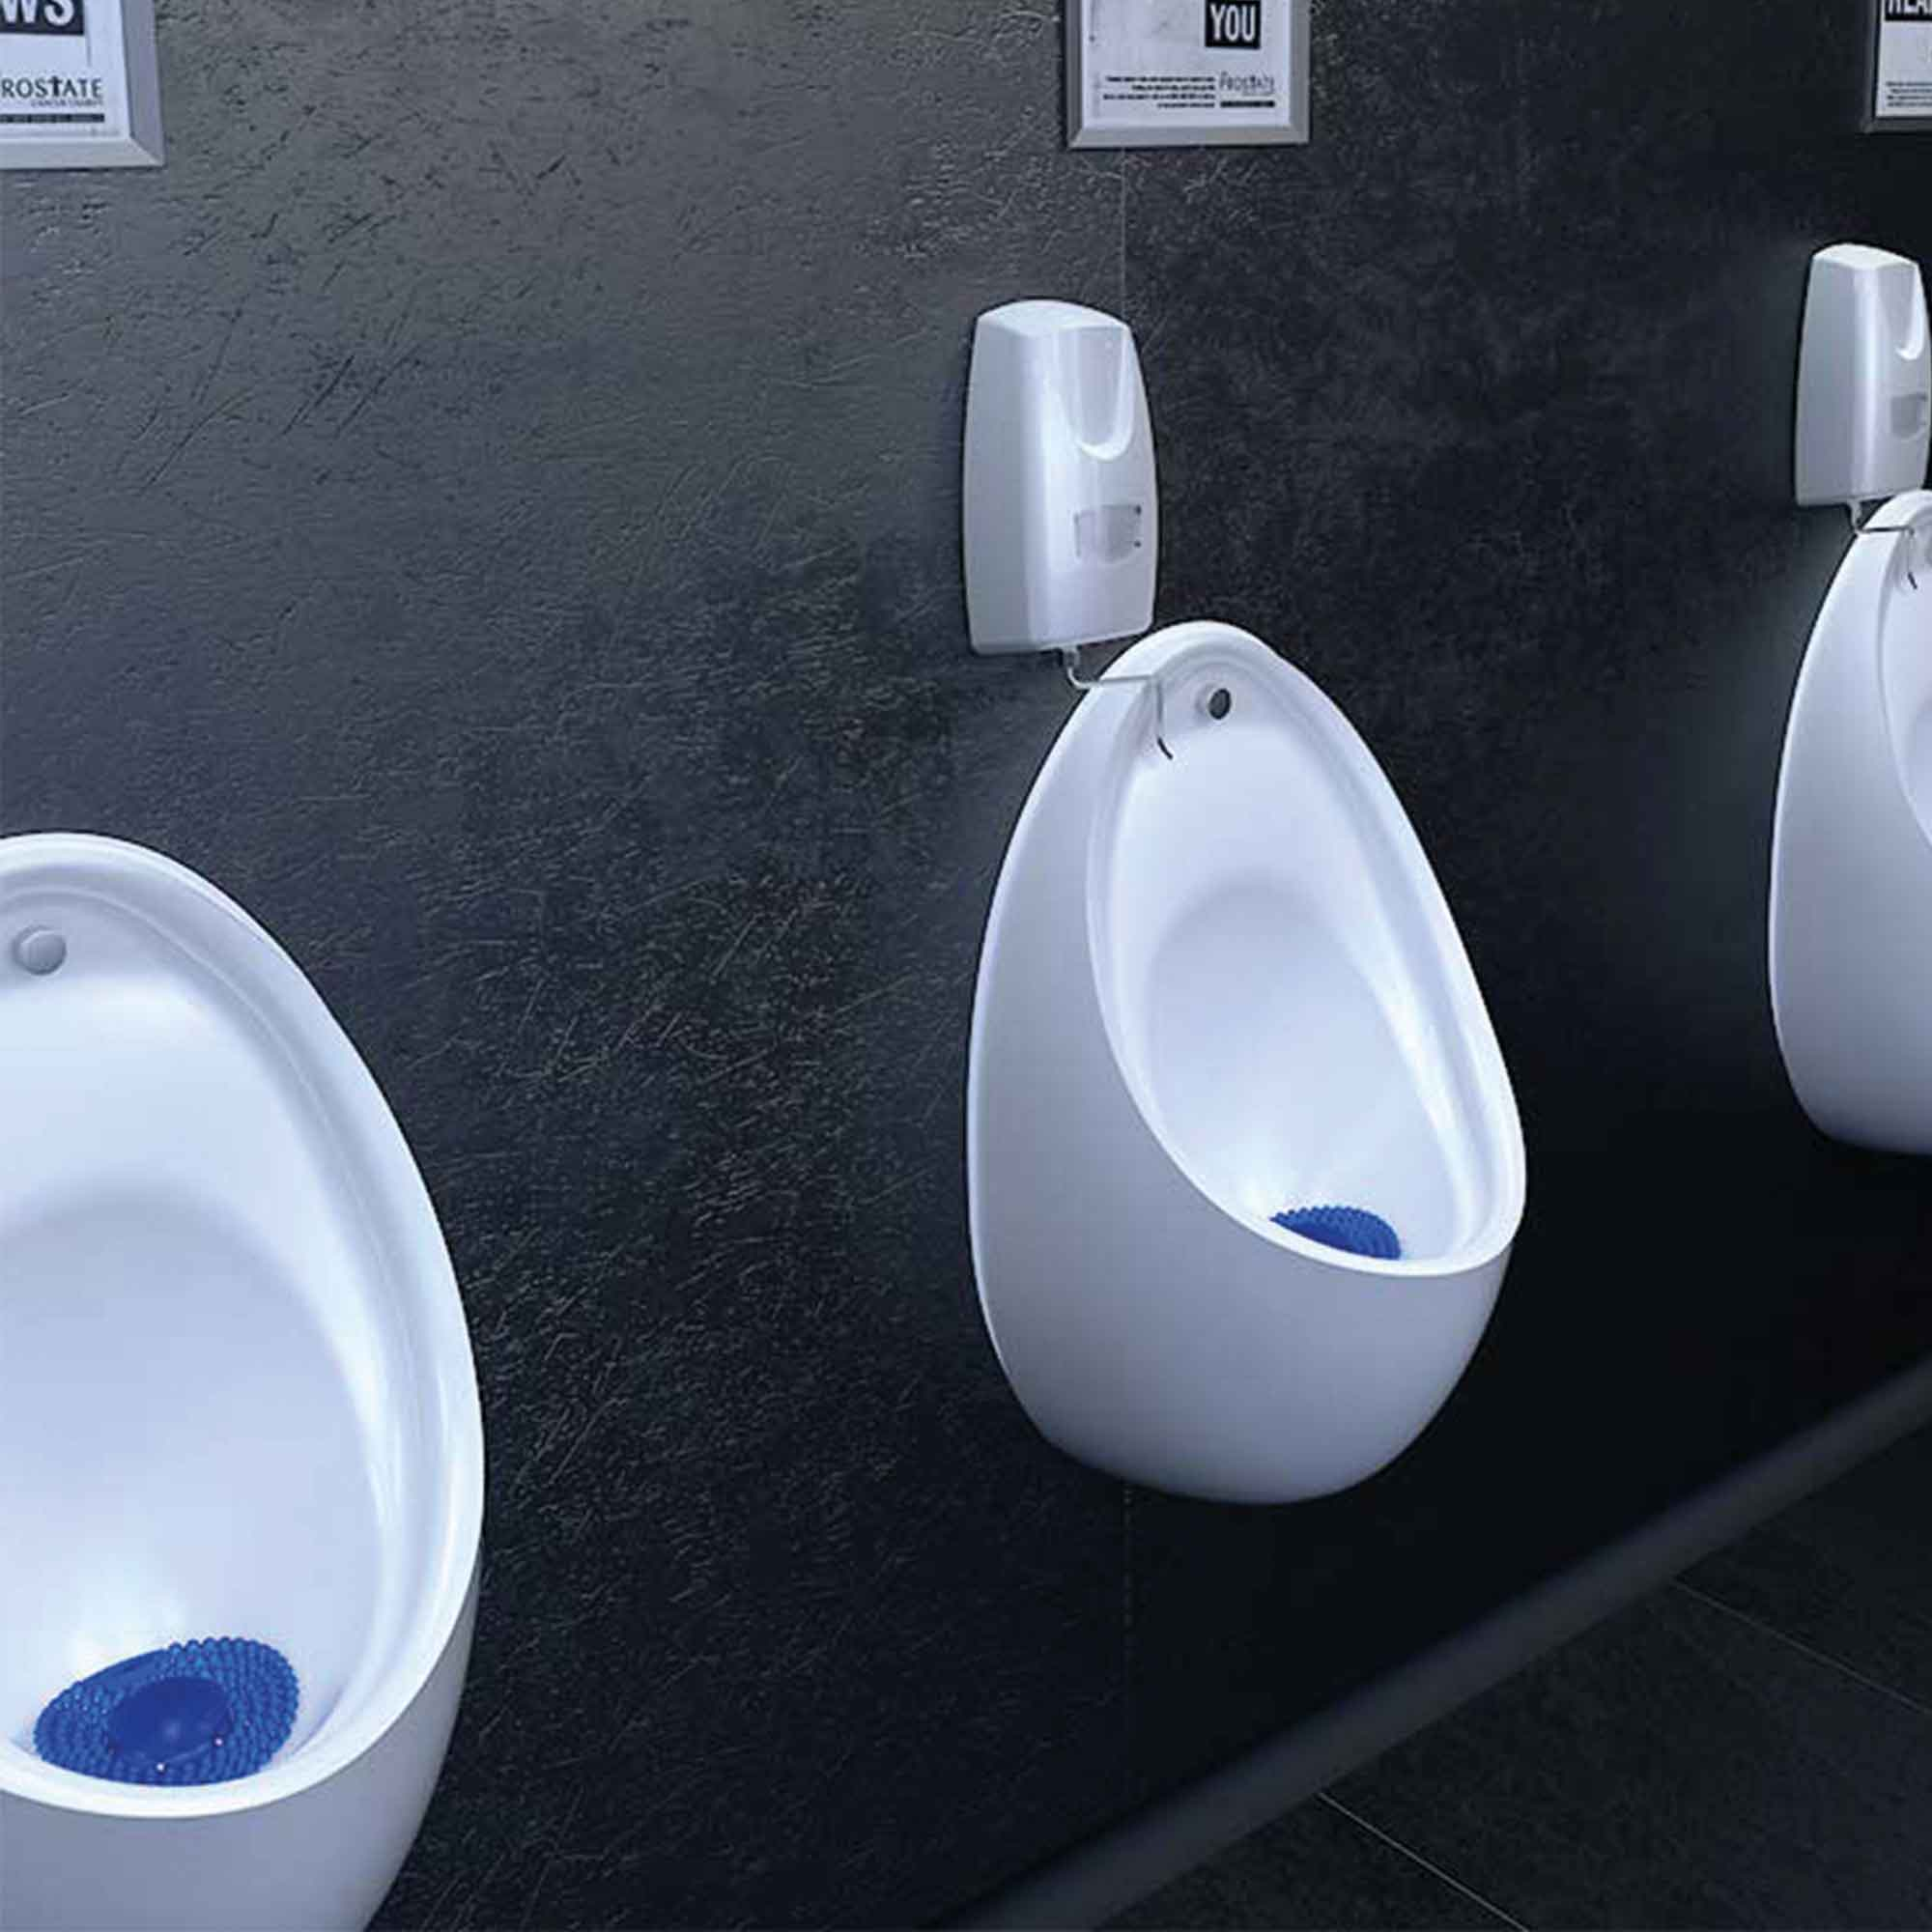 P-Screen® 60 Day Urinal Screen in Urinal